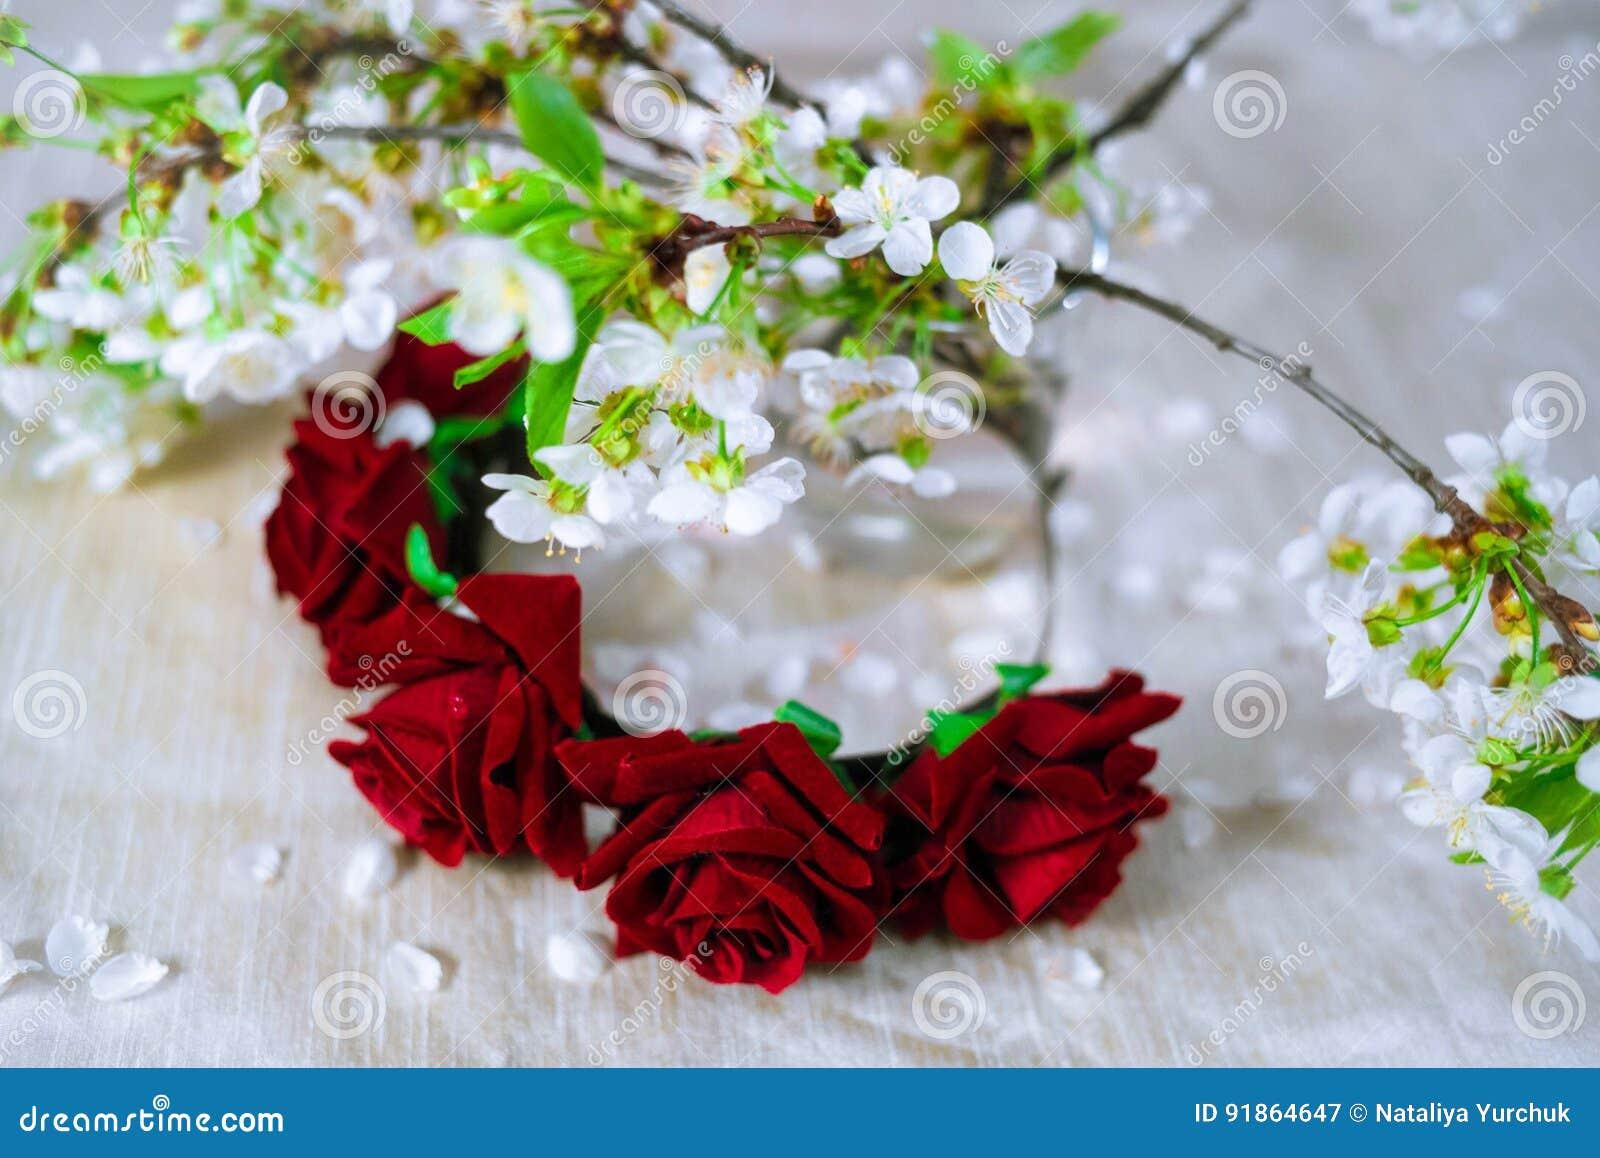 Thin red wreath with cherry blossom stock image image of roses download thin red wreath with cherry blossom stock image image of roses decoration izmirmasajfo